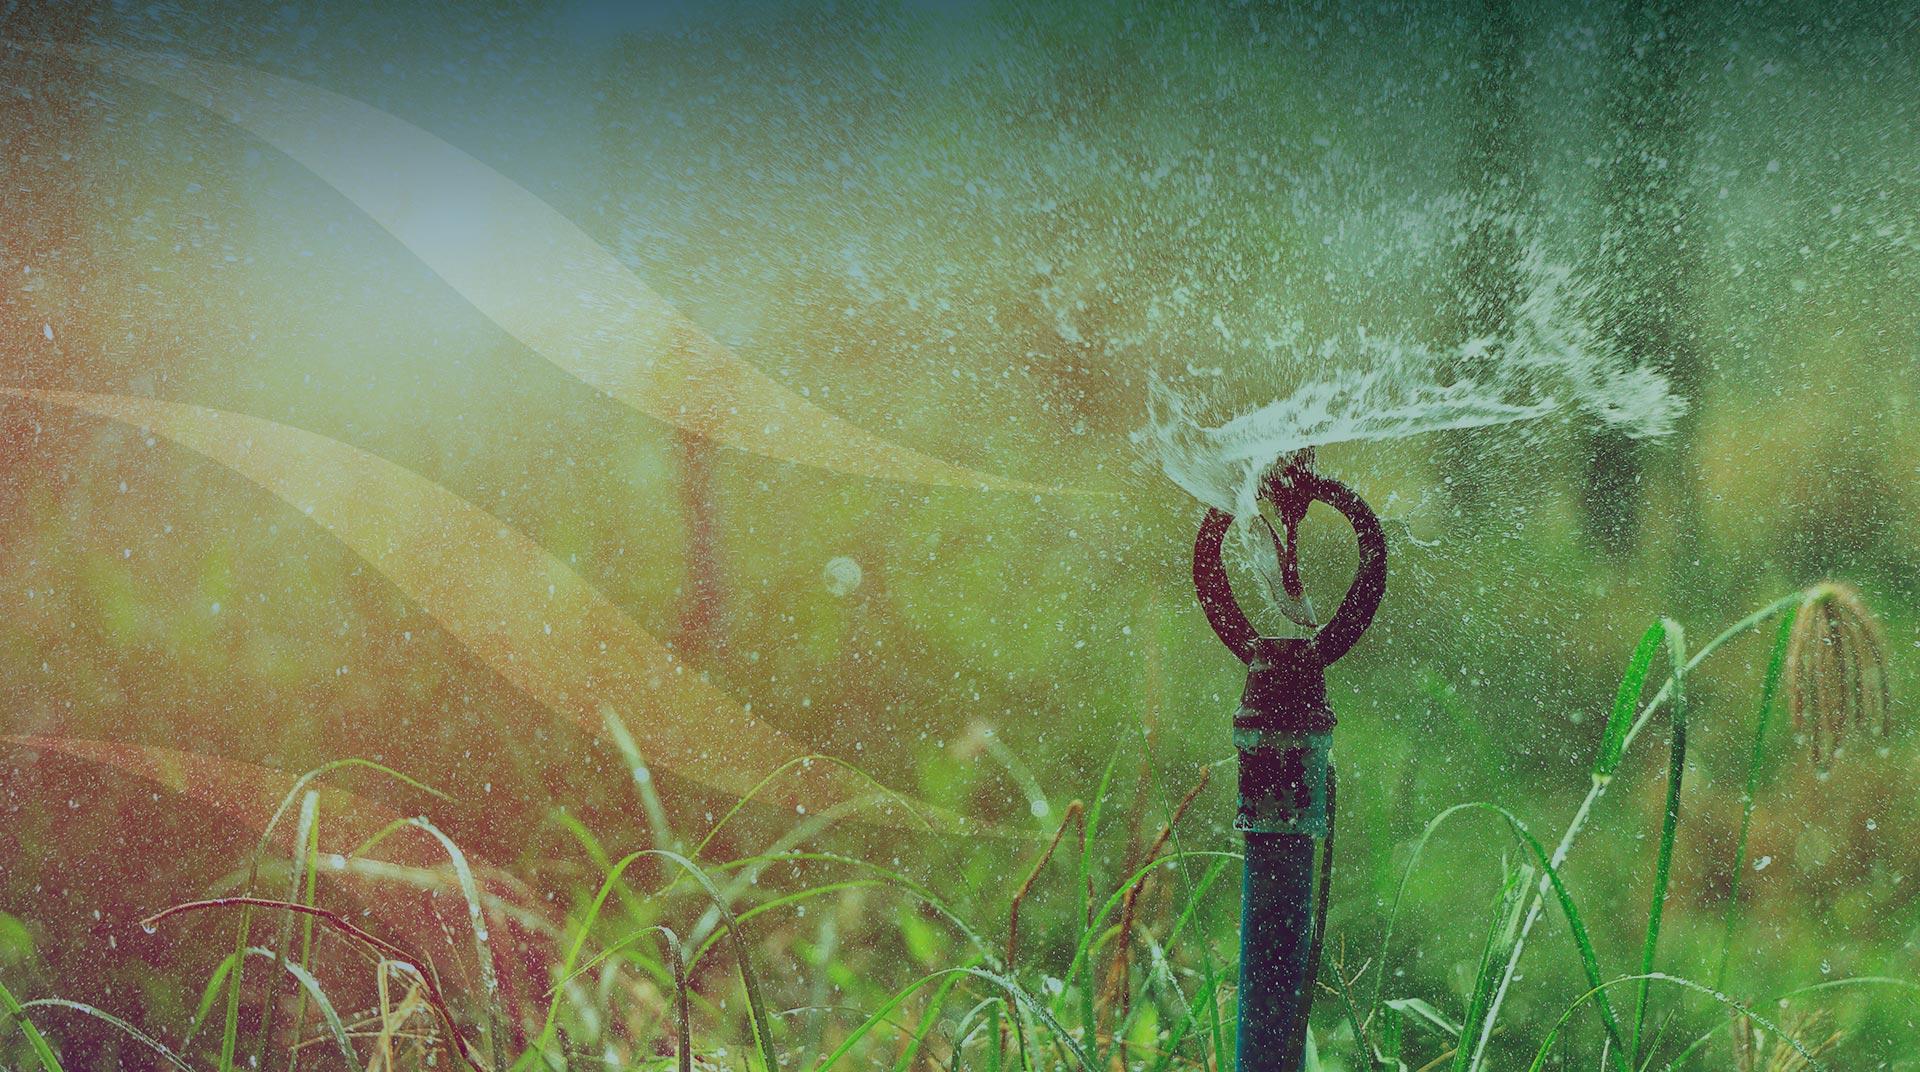 Sebico Brasil - Saneamento Ambiental